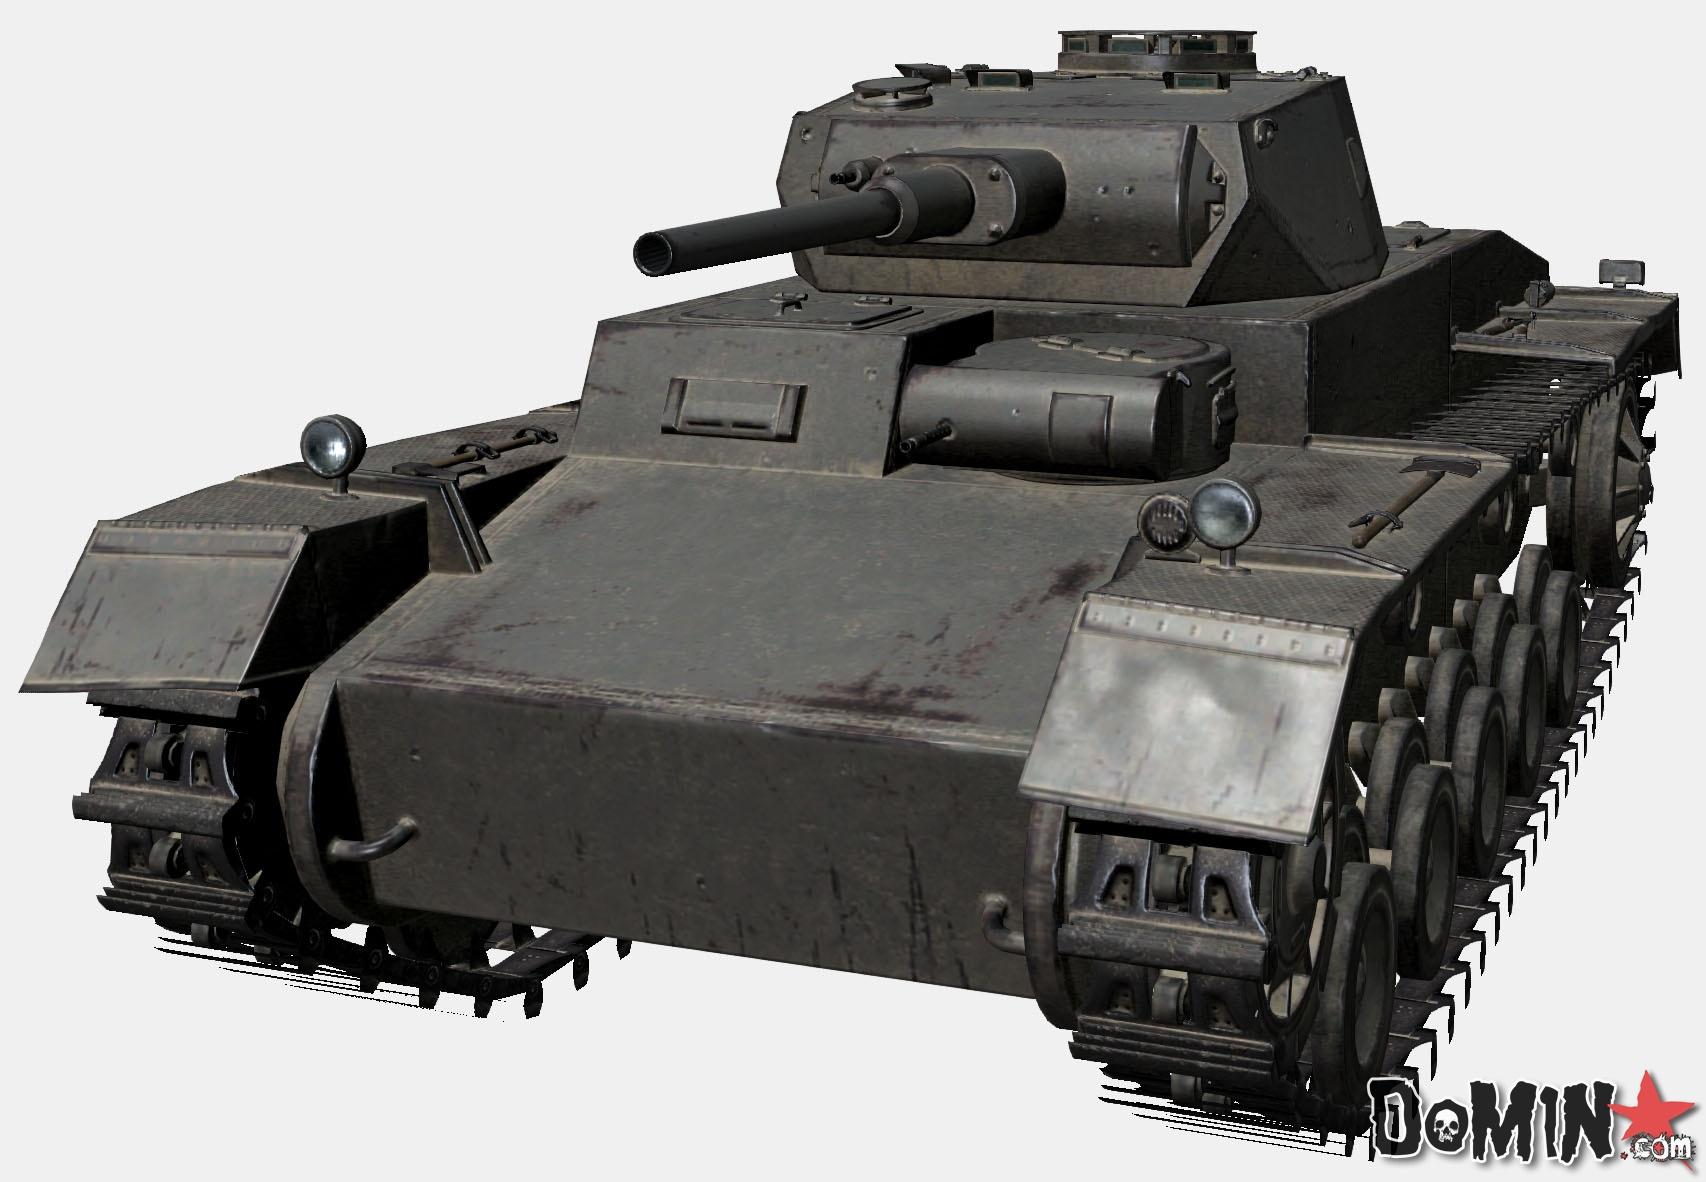 Vk651